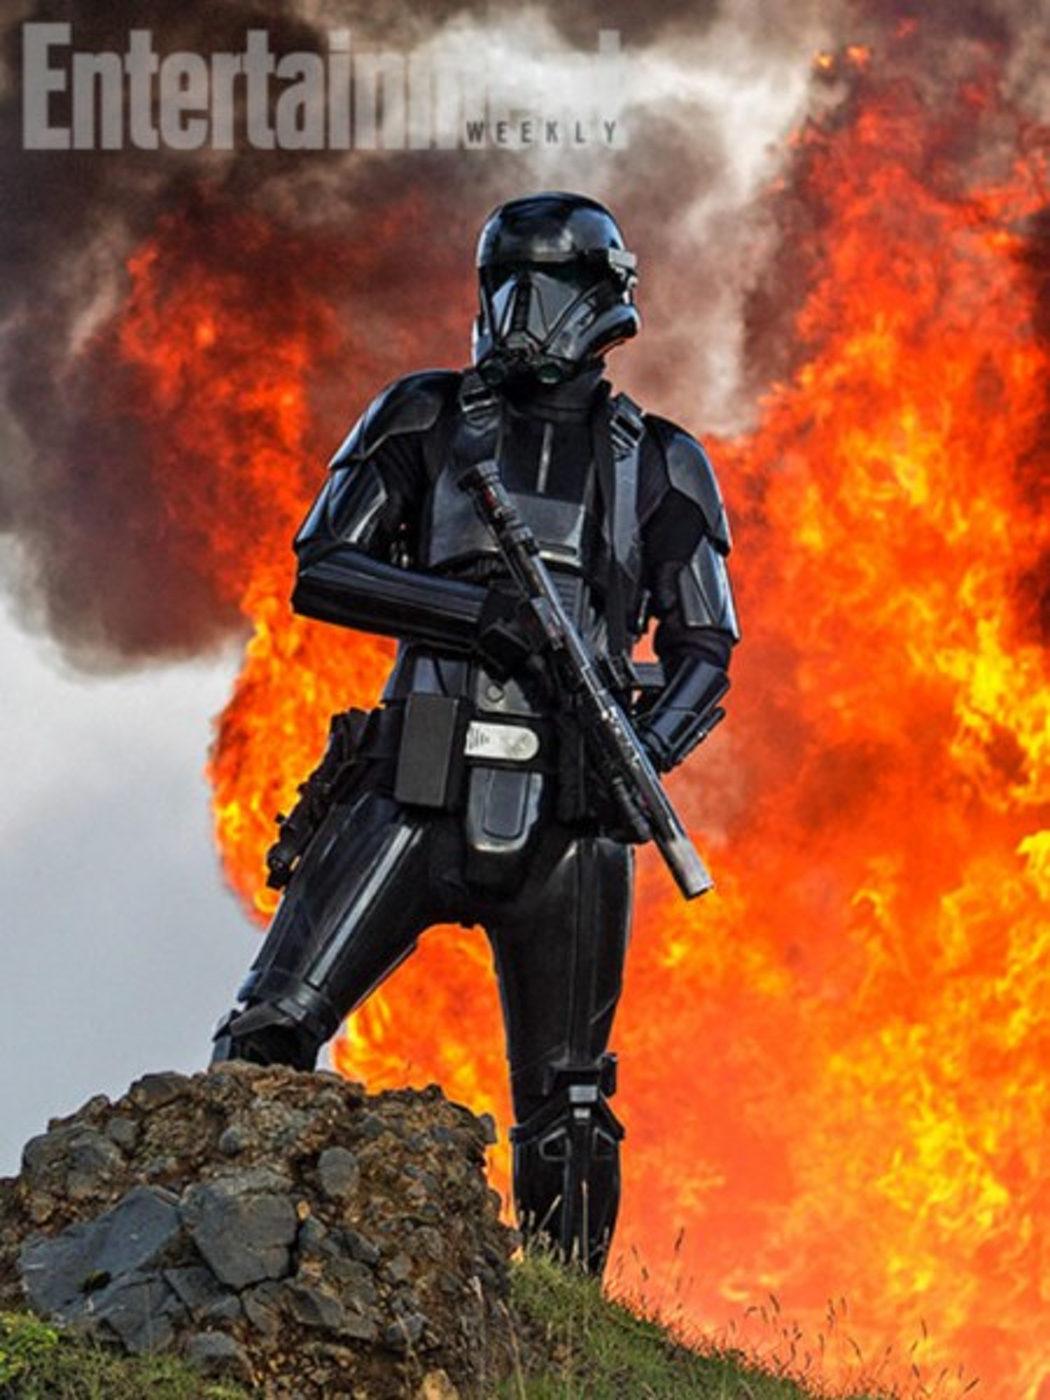 Un stormtrooper en 'Rogue One'